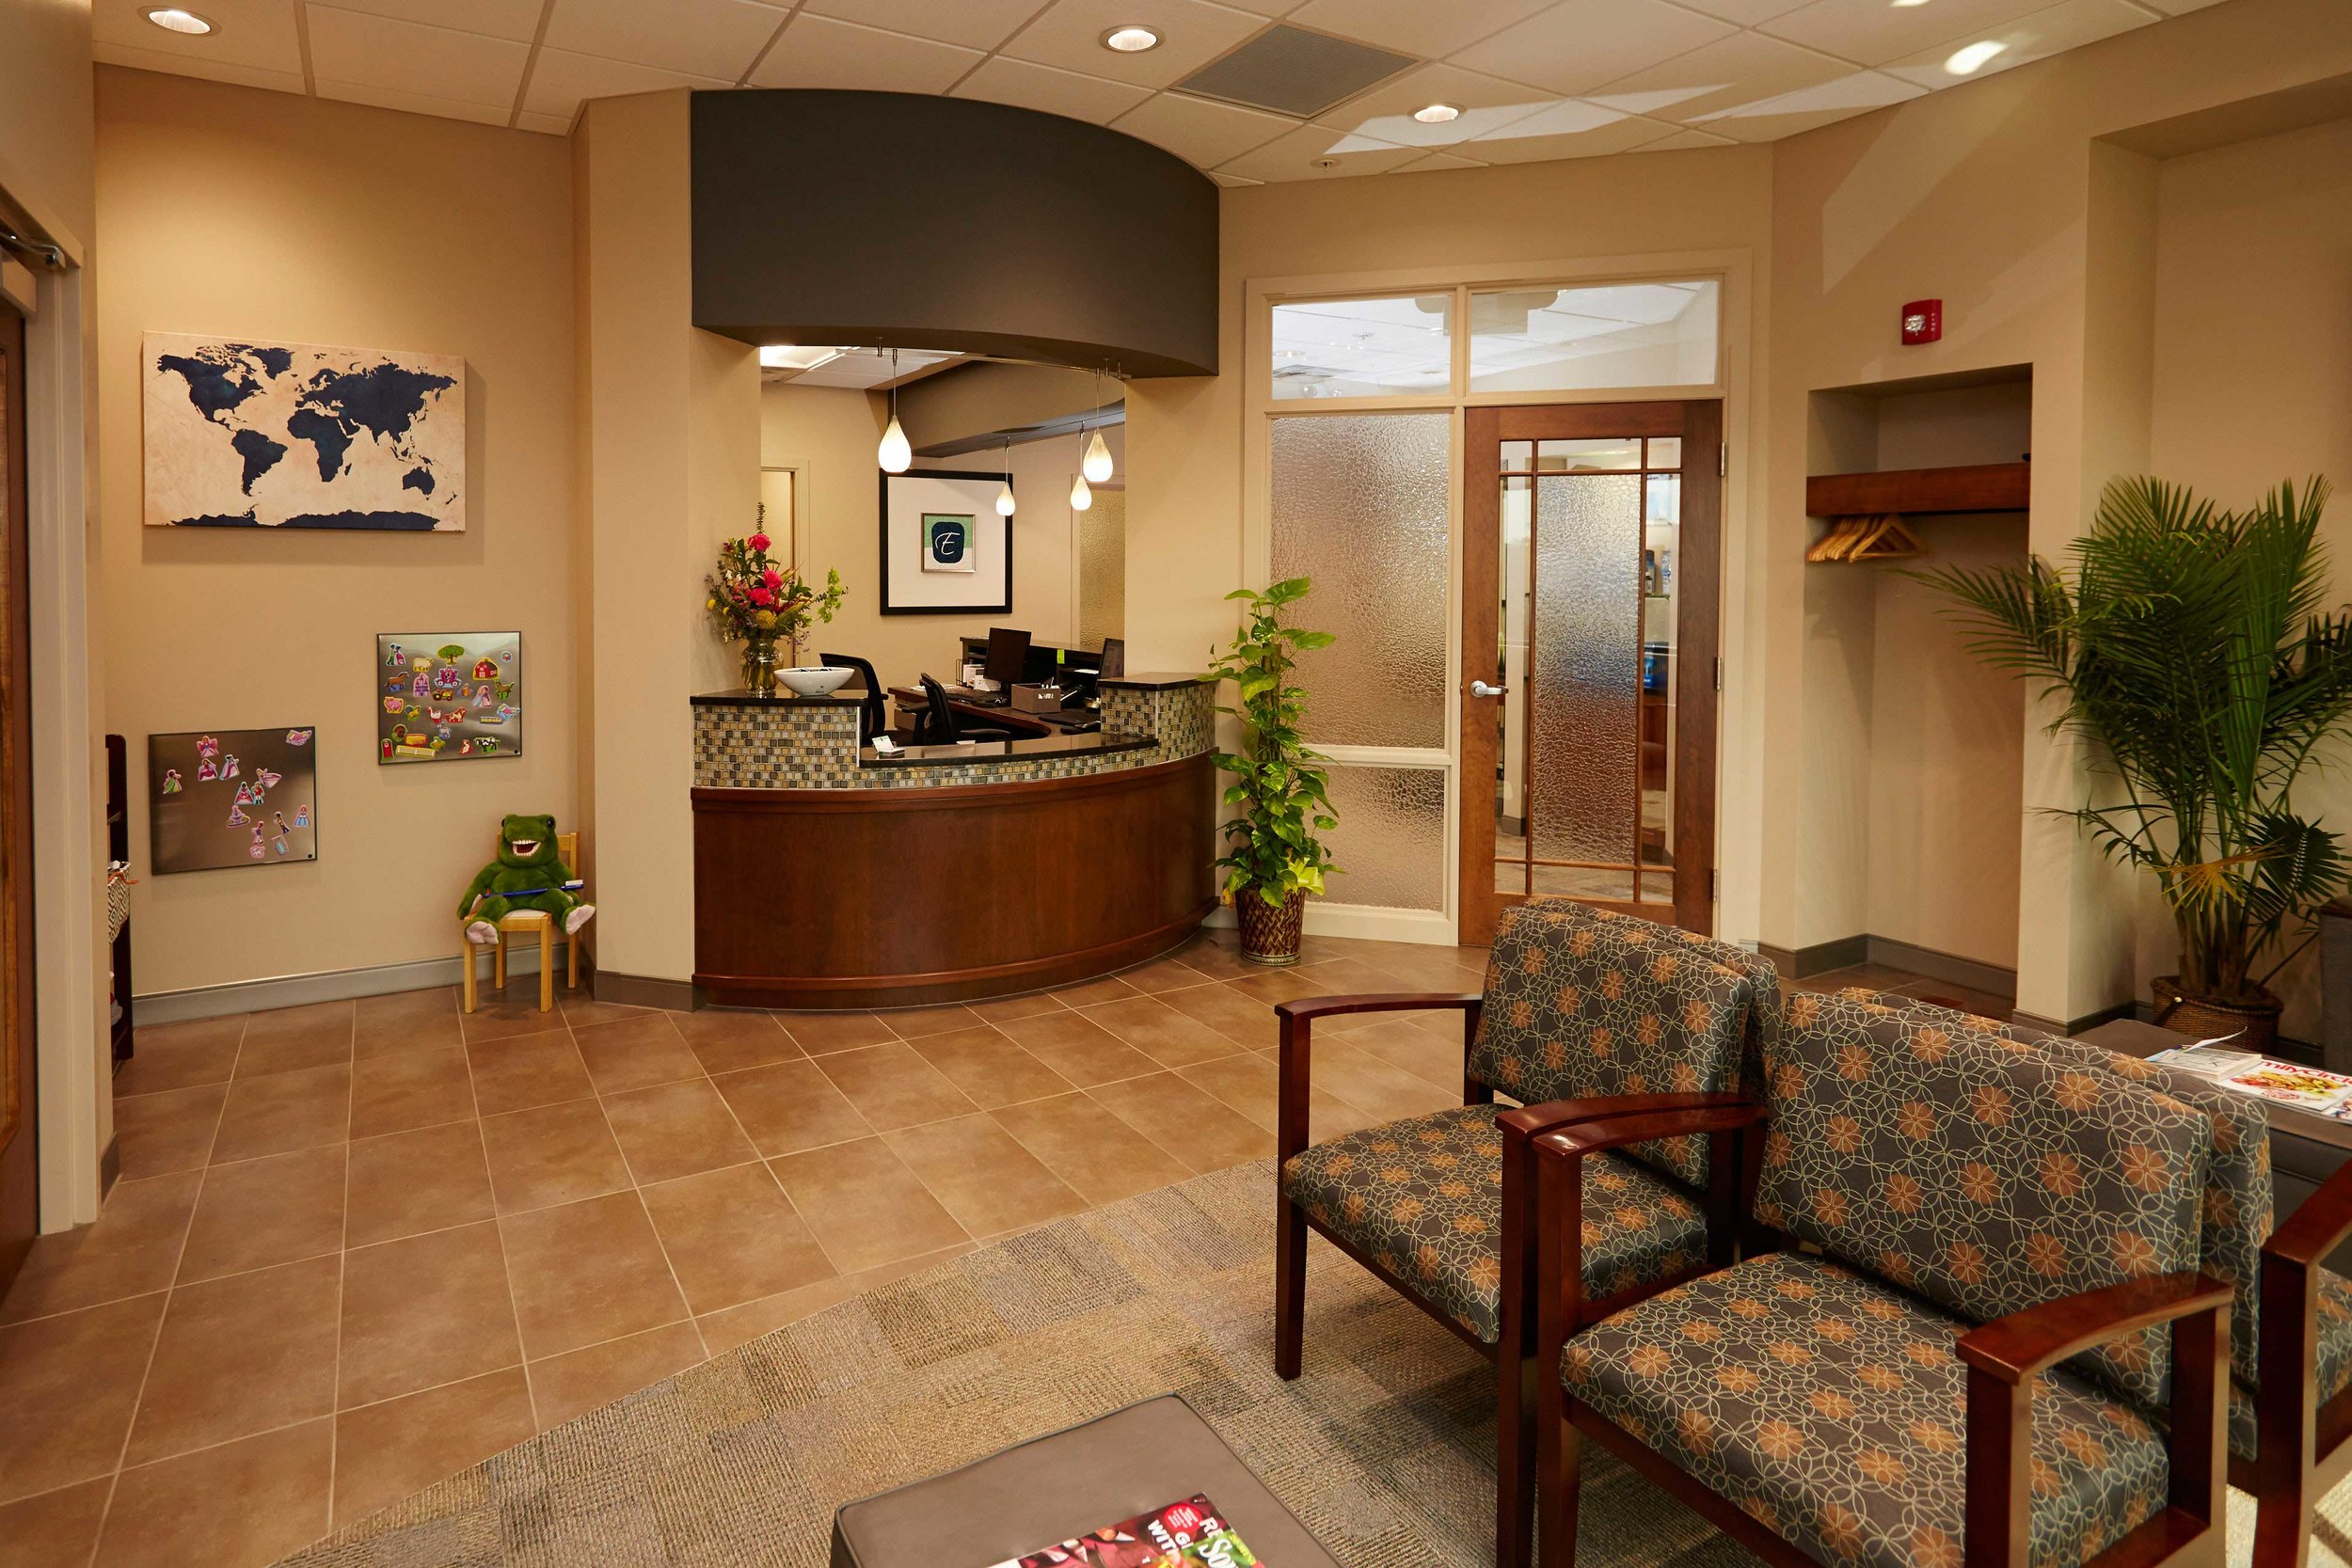 The Award Winning Ellis Dental Waiting Room in St. Louis, Missouri